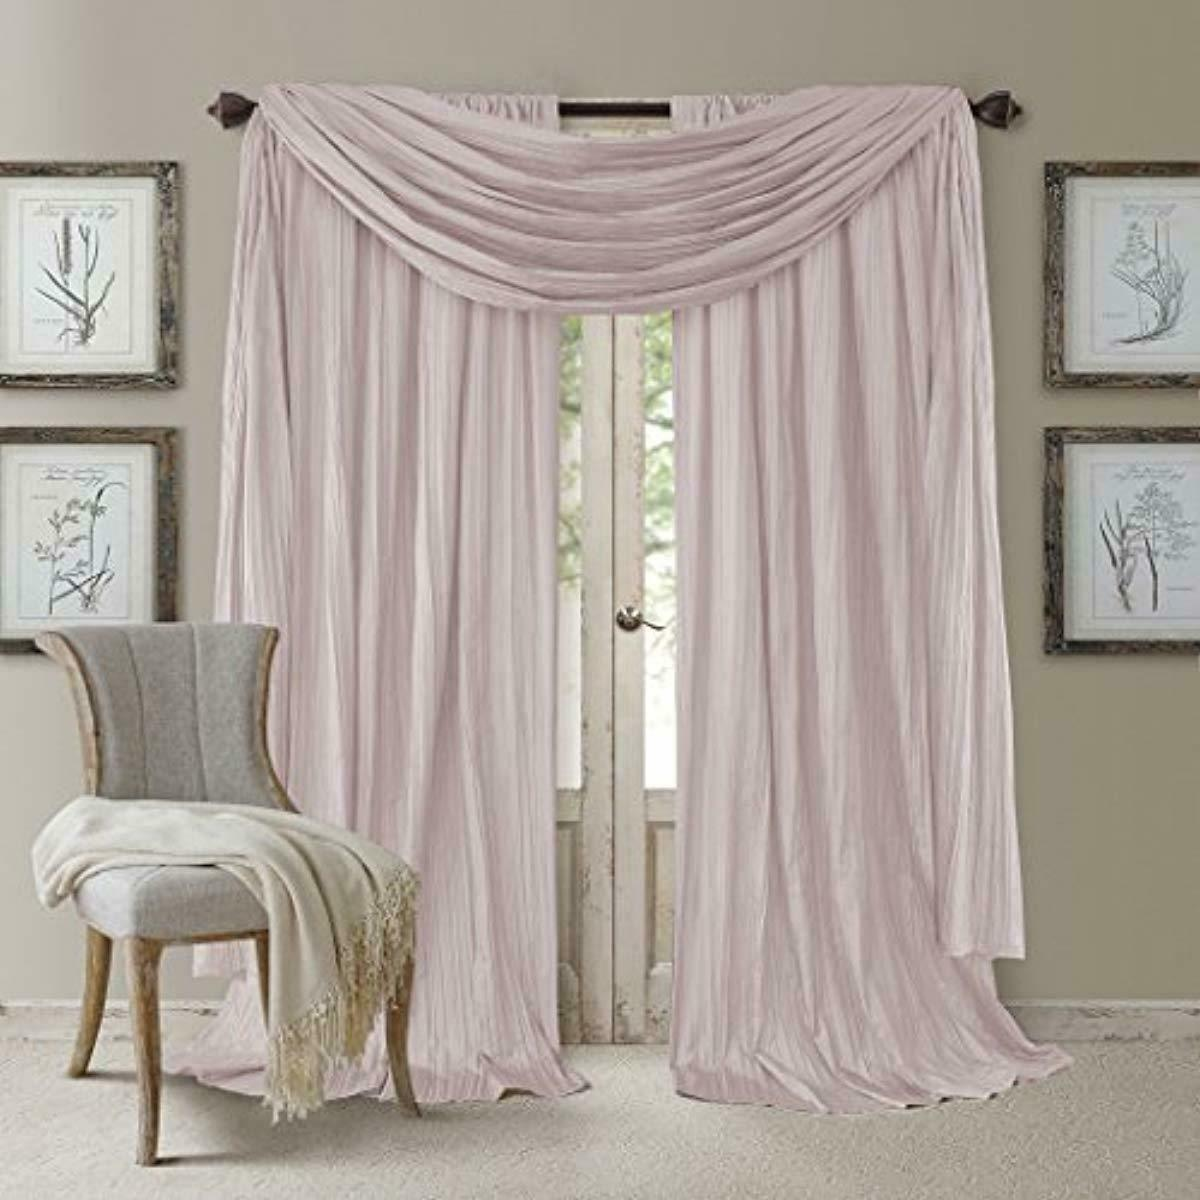 Set 2 Blush Pink Faux Silk Curtains